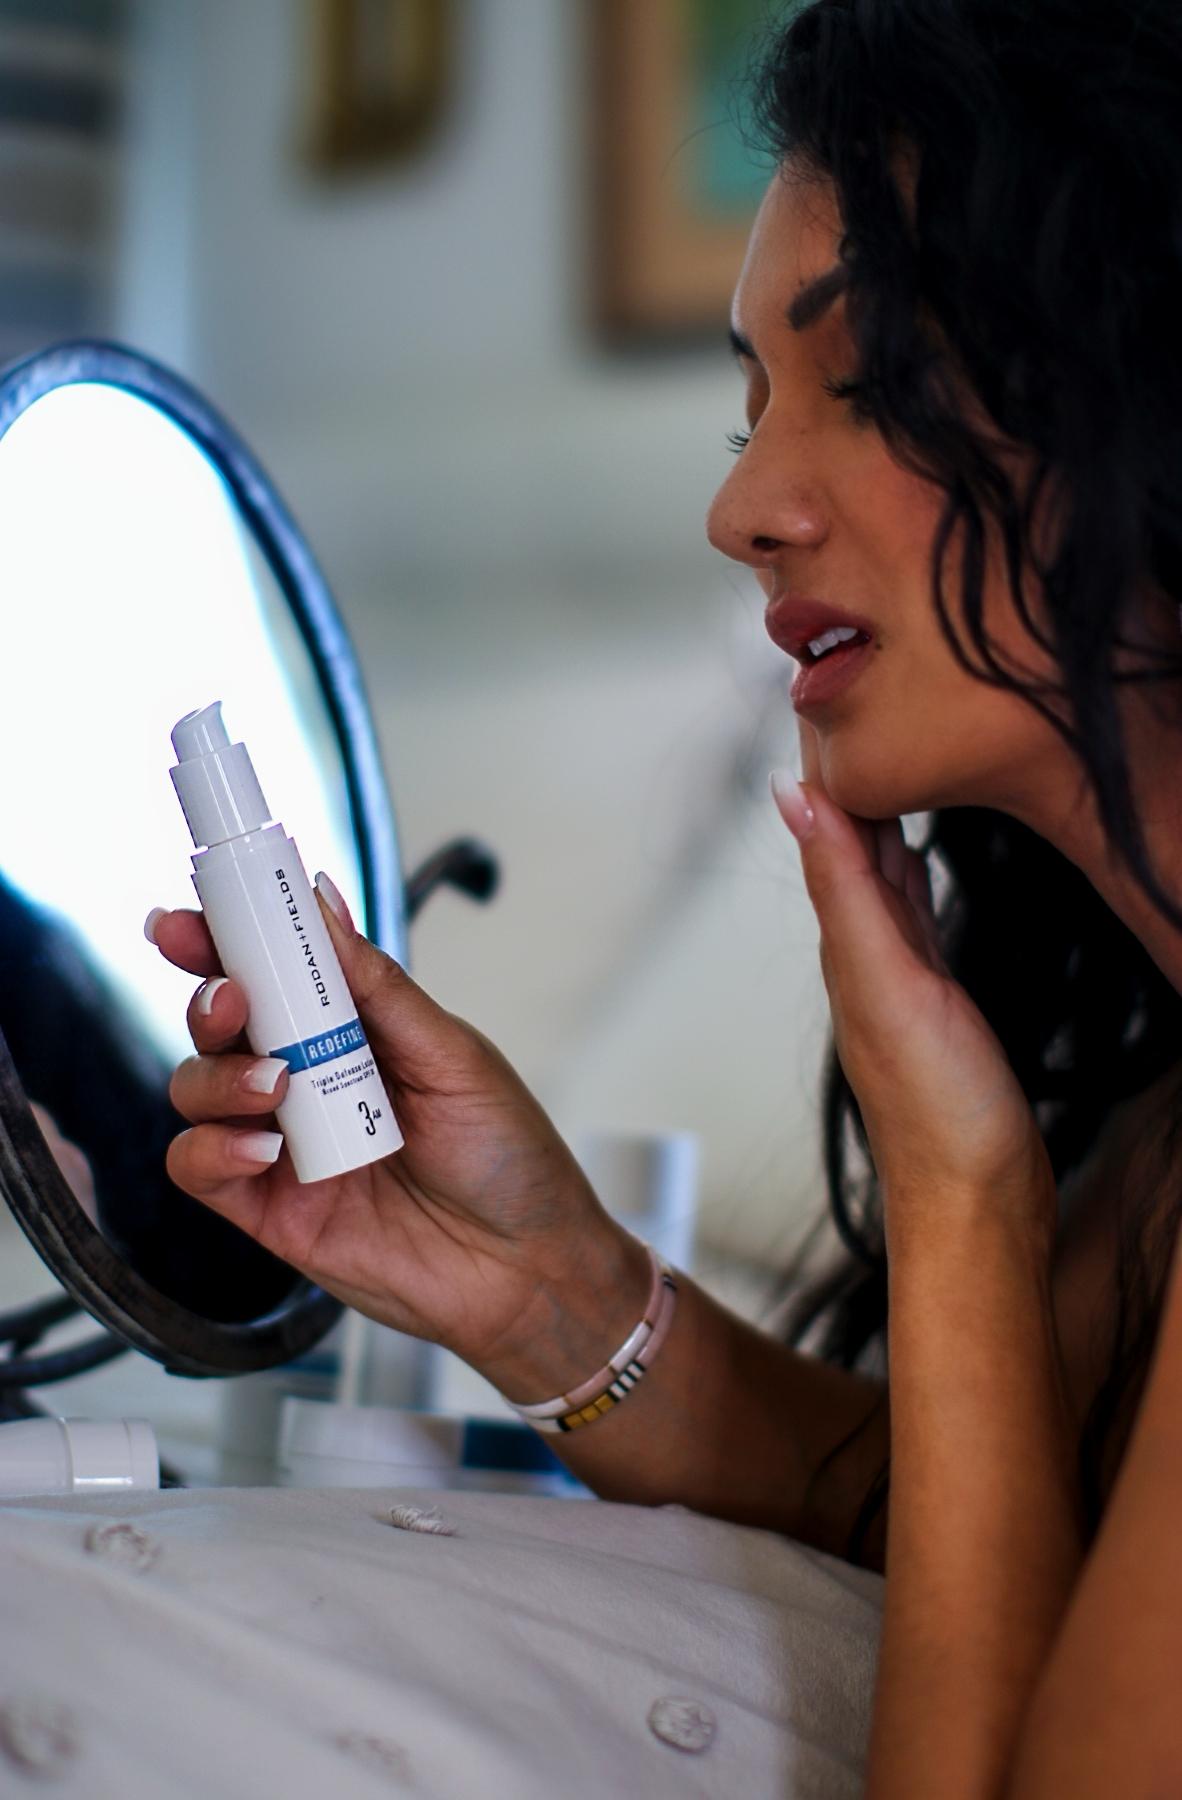 Addressing Aging Skin Thanks To Rodan + Fields REDEFINE Regimen | Debbie Savage Orange County Lifestyle + Beauty Blogger